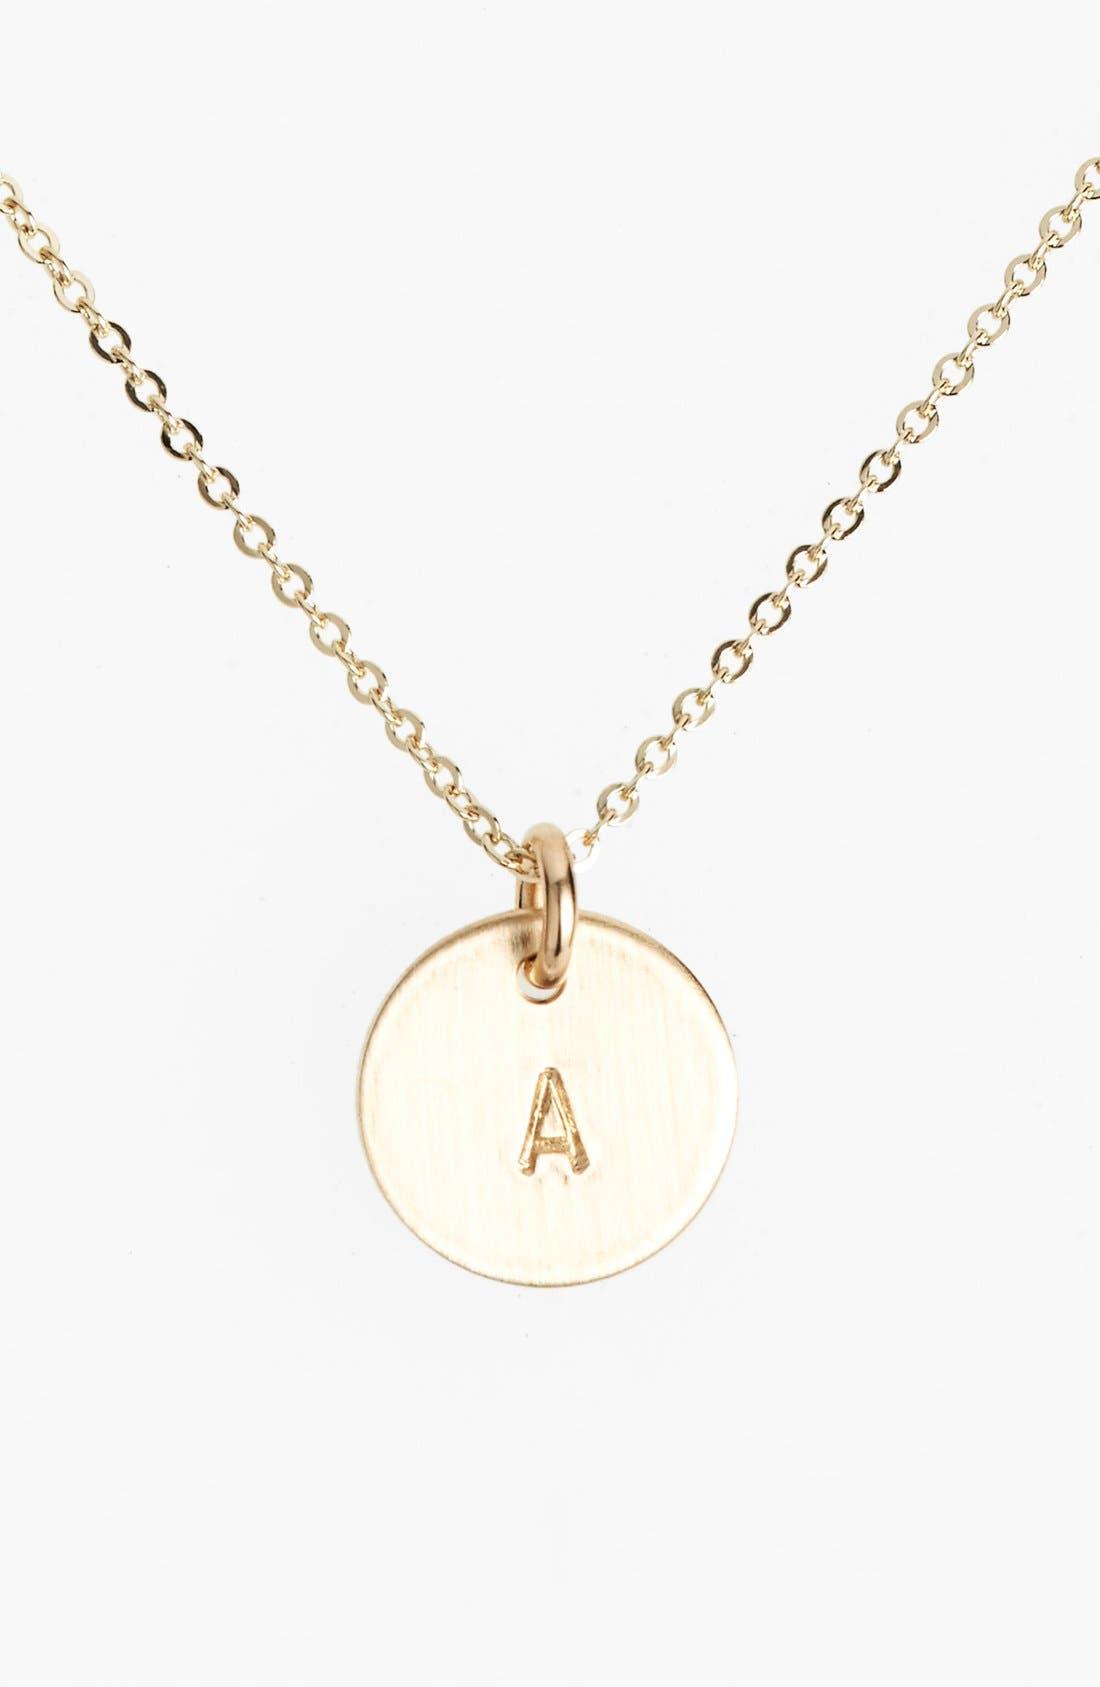 NASHELLE, 14k-Gold Fill Initial Mini Circle Necklace, Main thumbnail 1, color, 14K GOLD FILL A